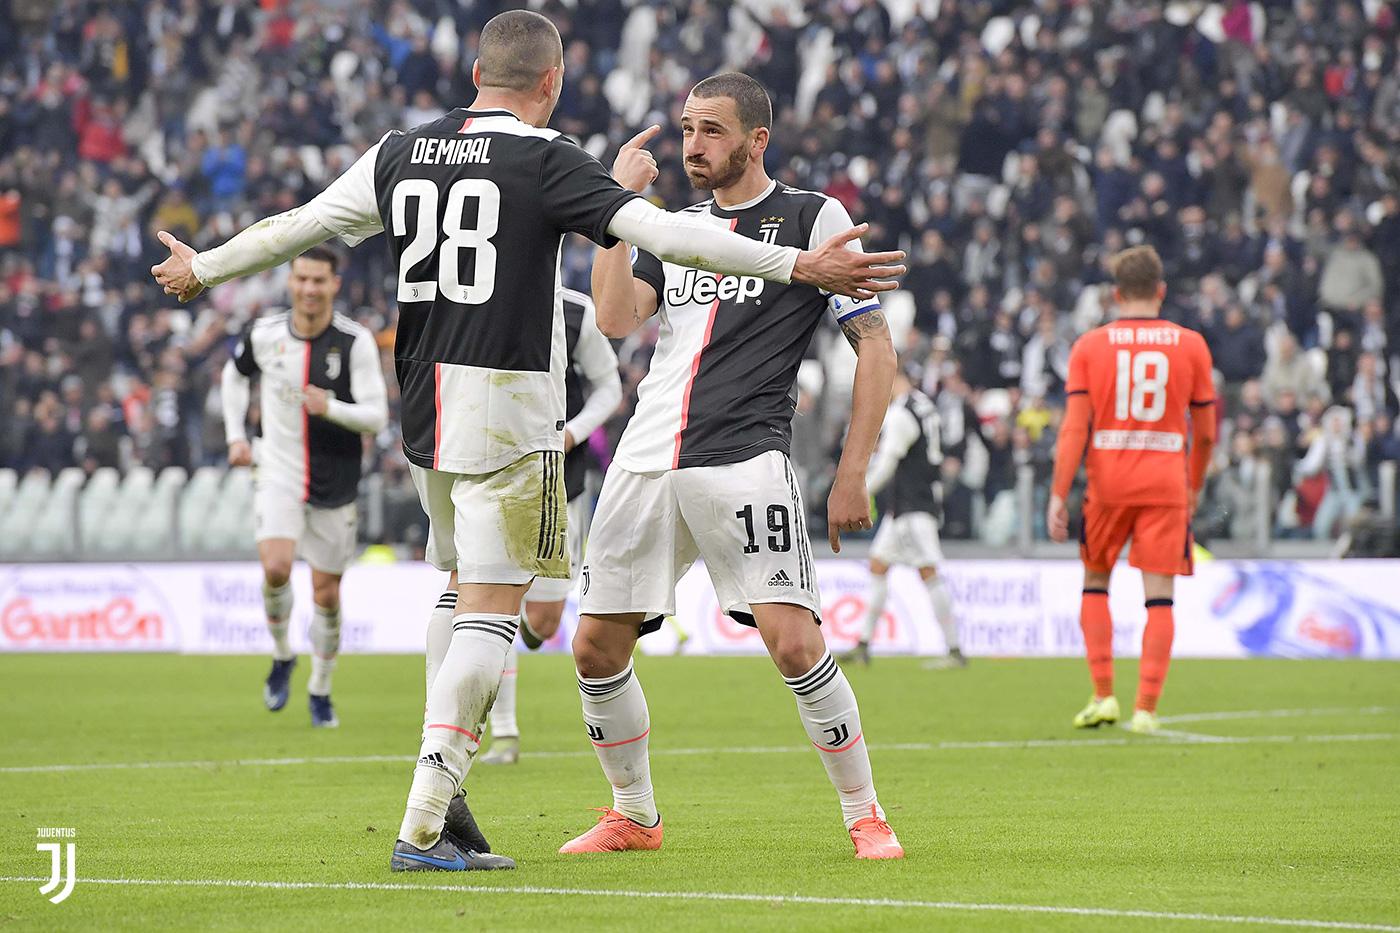 Juventus-Udinese 3-1, doppio Ronaldo col tridente